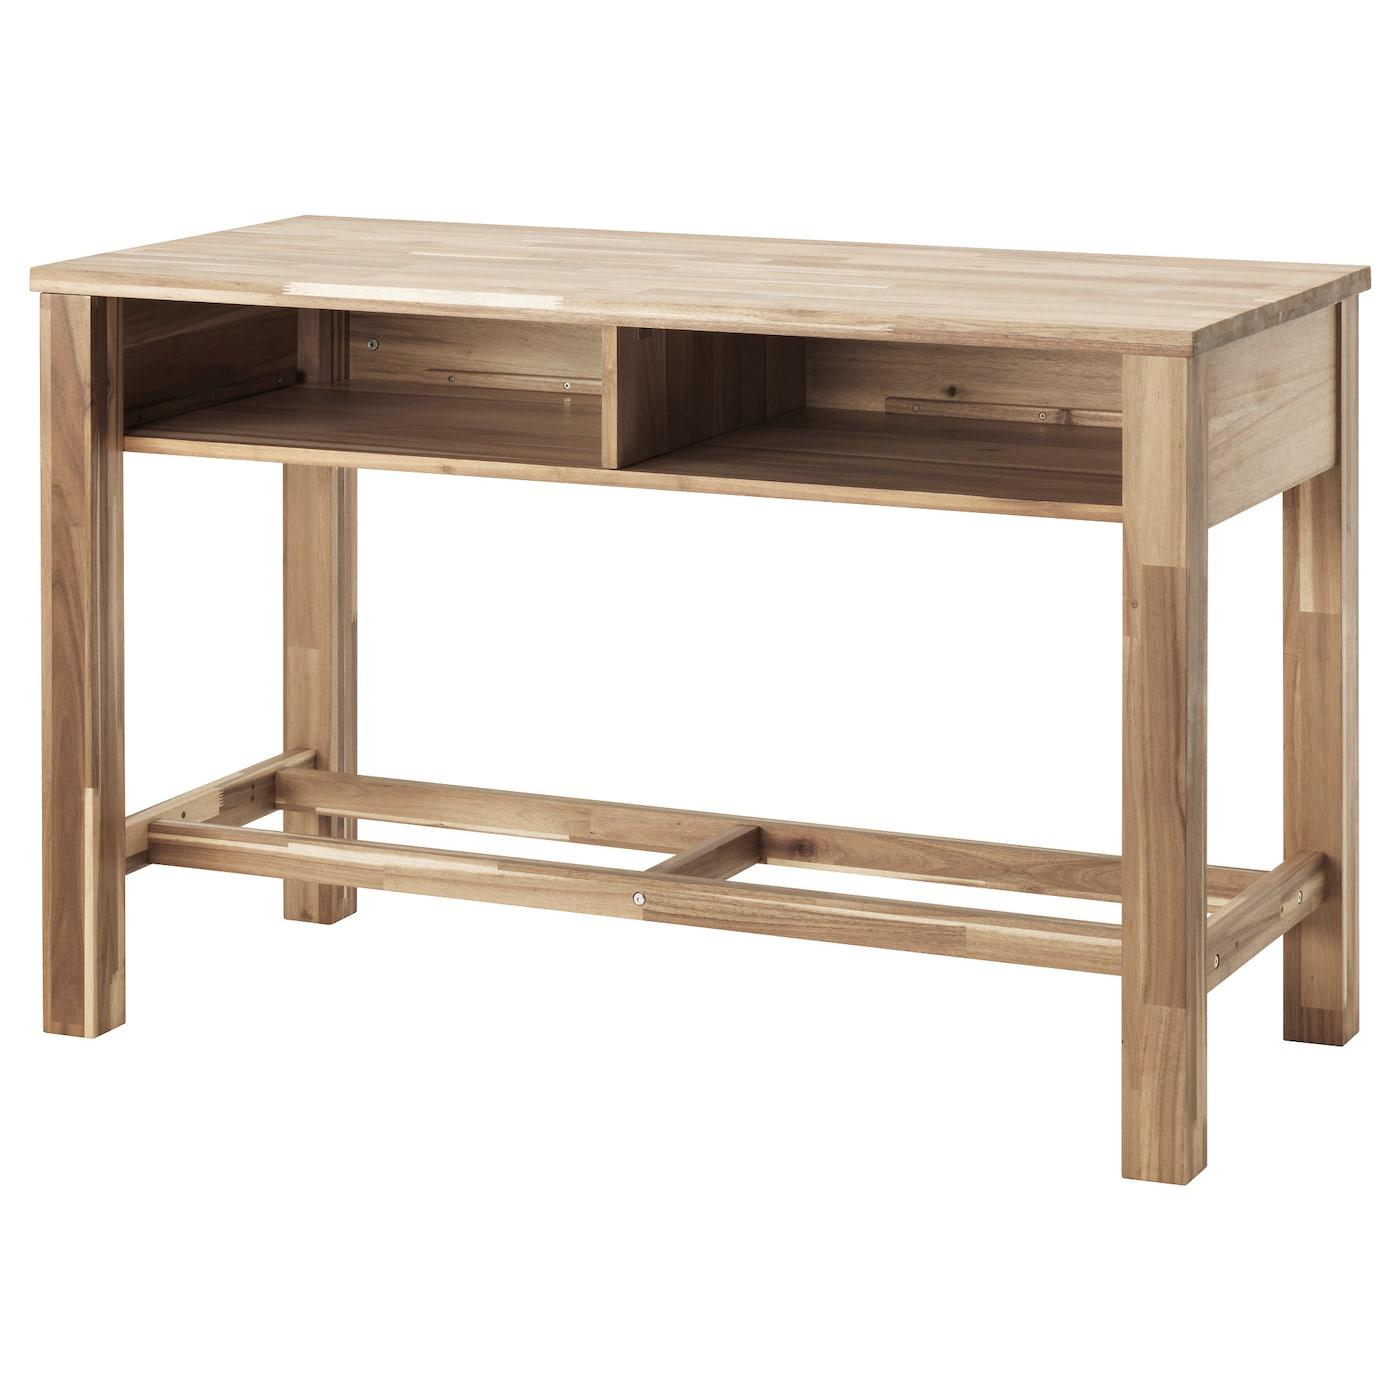 skogsta bartafel acacia 140x64 cm ikea. Black Bedroom Furniture Sets. Home Design Ideas